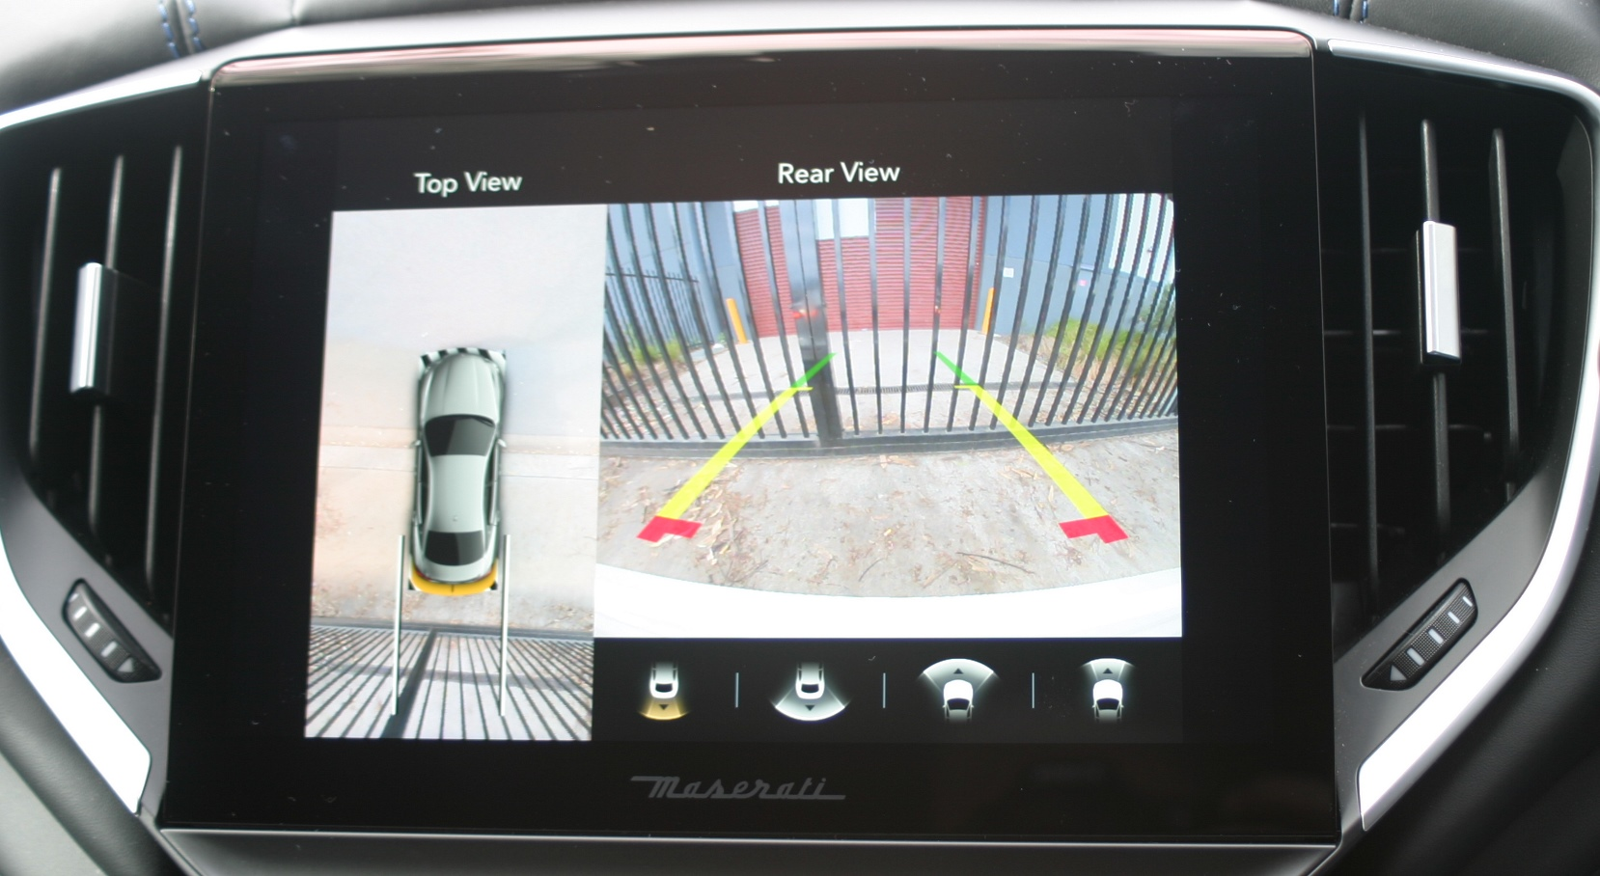 Maserati Ghibli Hybrid rear view camera